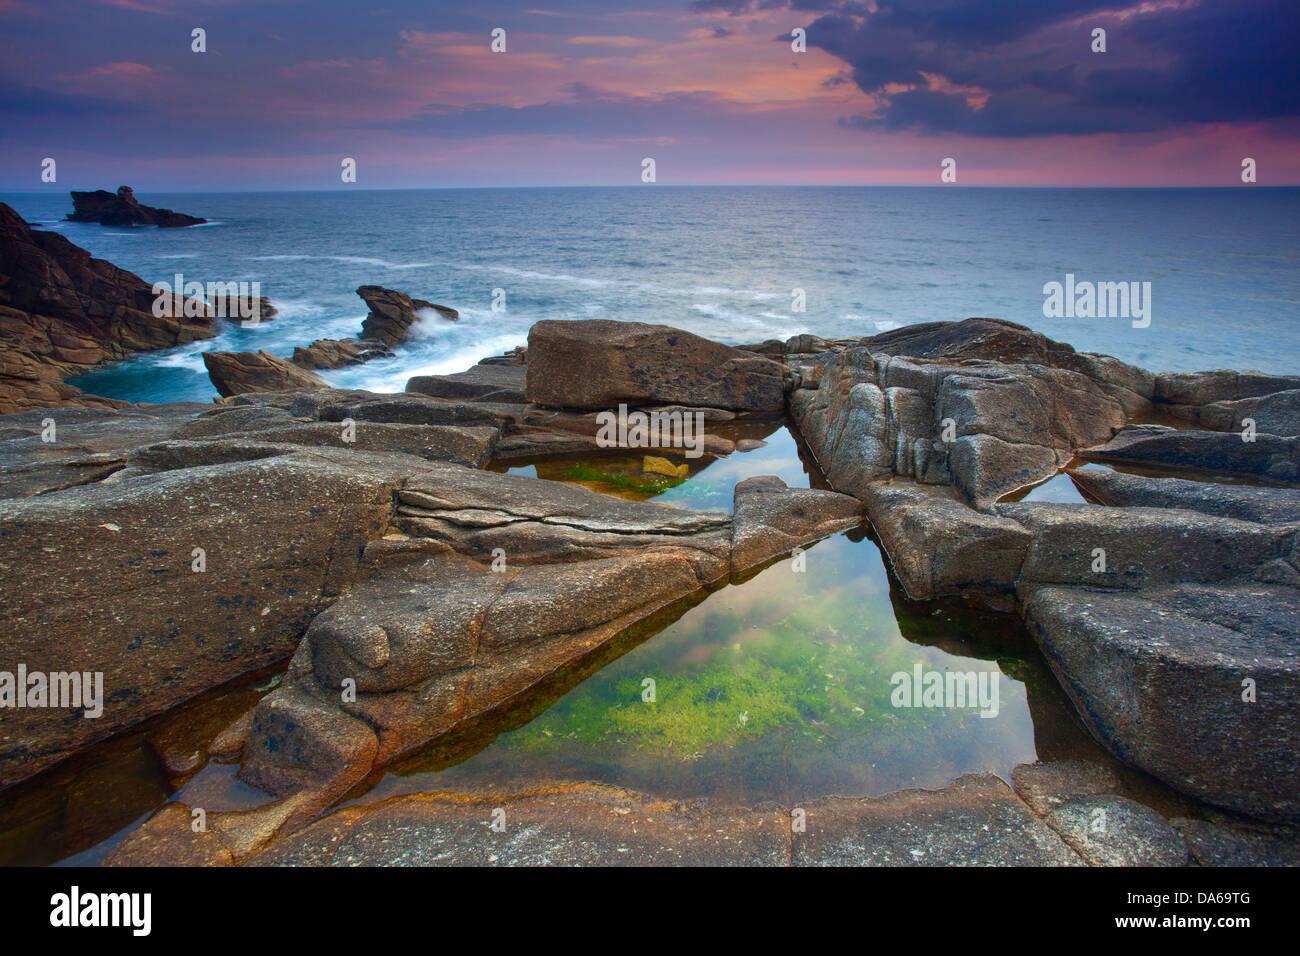 Côte Sauvage, France, Europe, Brittany, department Morbihan, coast, rock, cliff, sea, dusk, algae - Stock Image